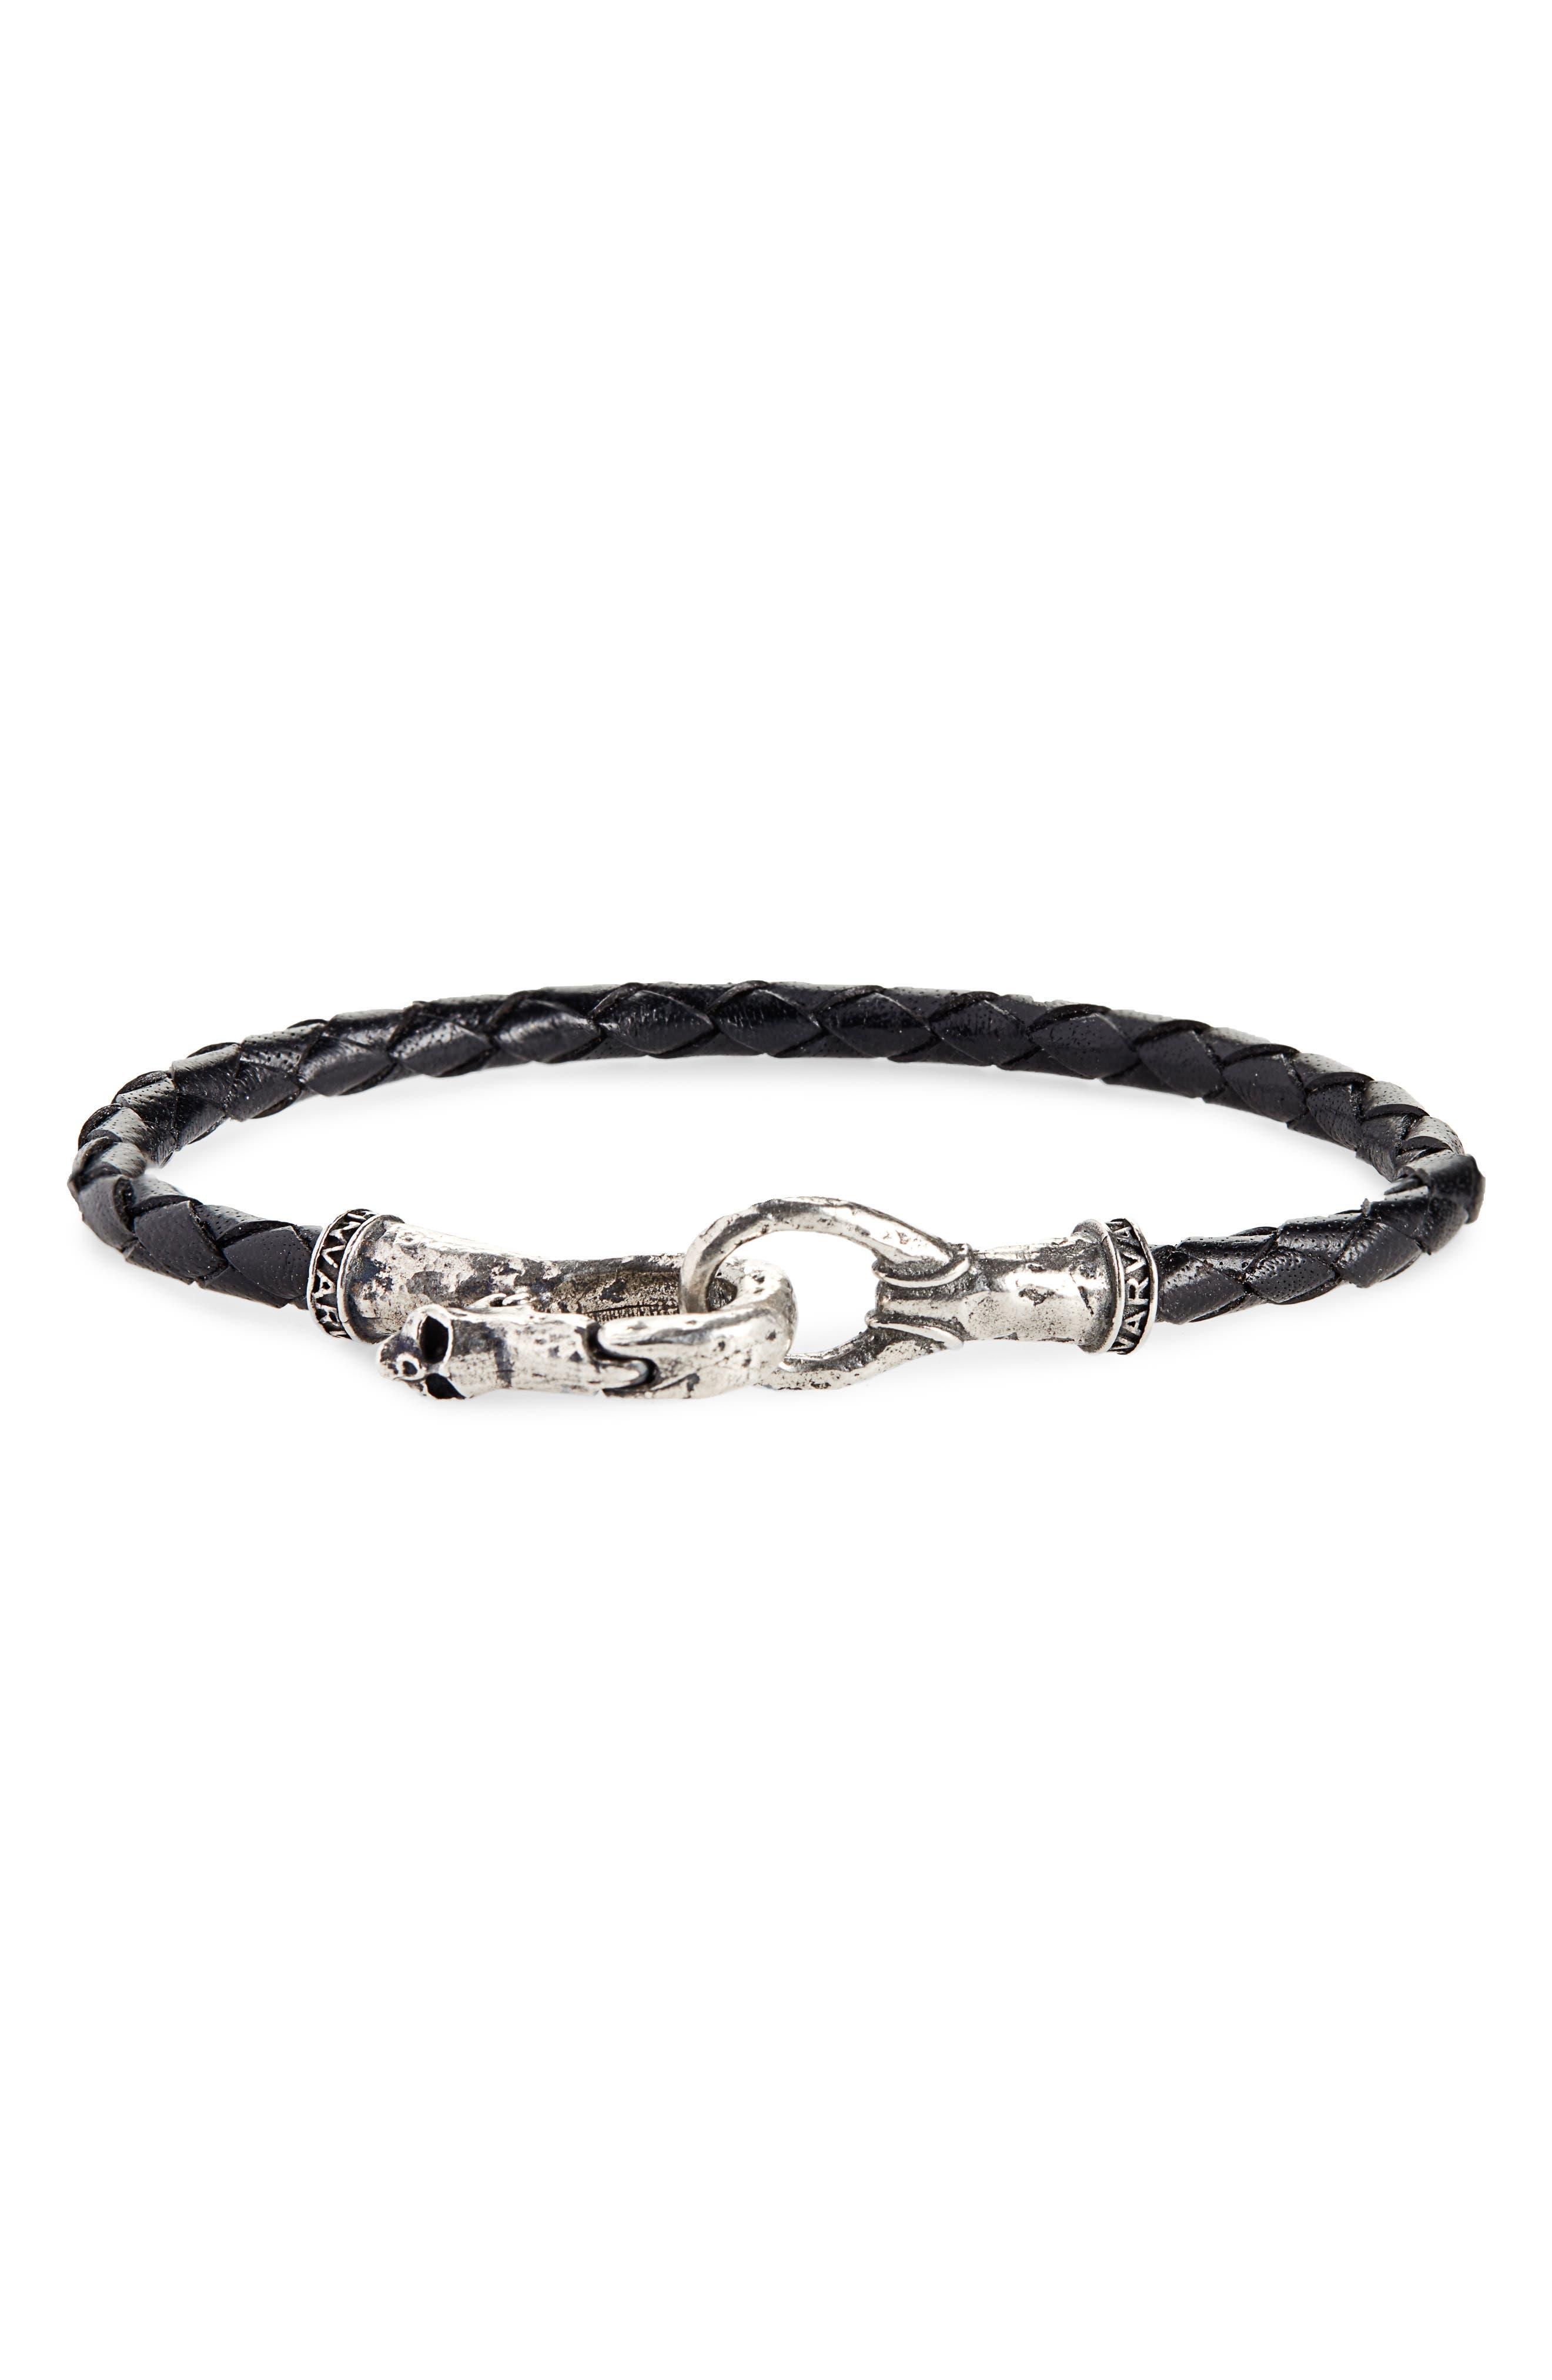 JOHN VARVATOS, Braided Leather Bracelet, Main thumbnail 1, color, BLACK